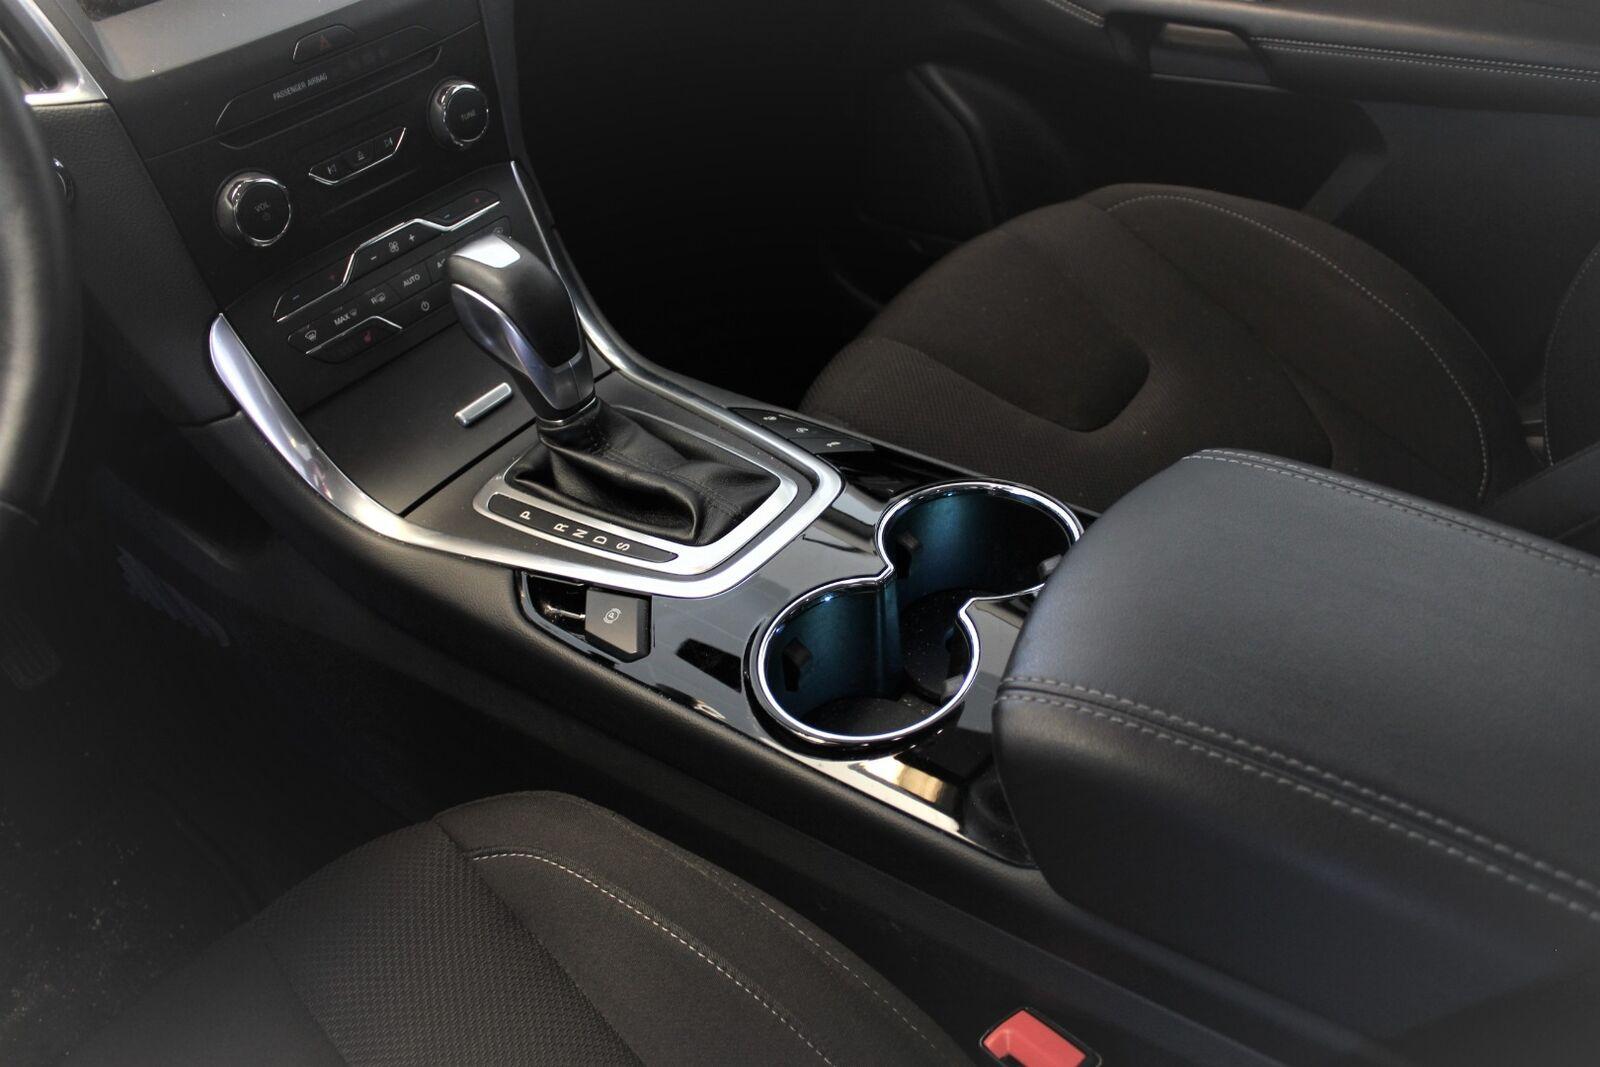 Ford S-MAX 2,0 TDCi 180 Titanium aut. 7prs - billede 10